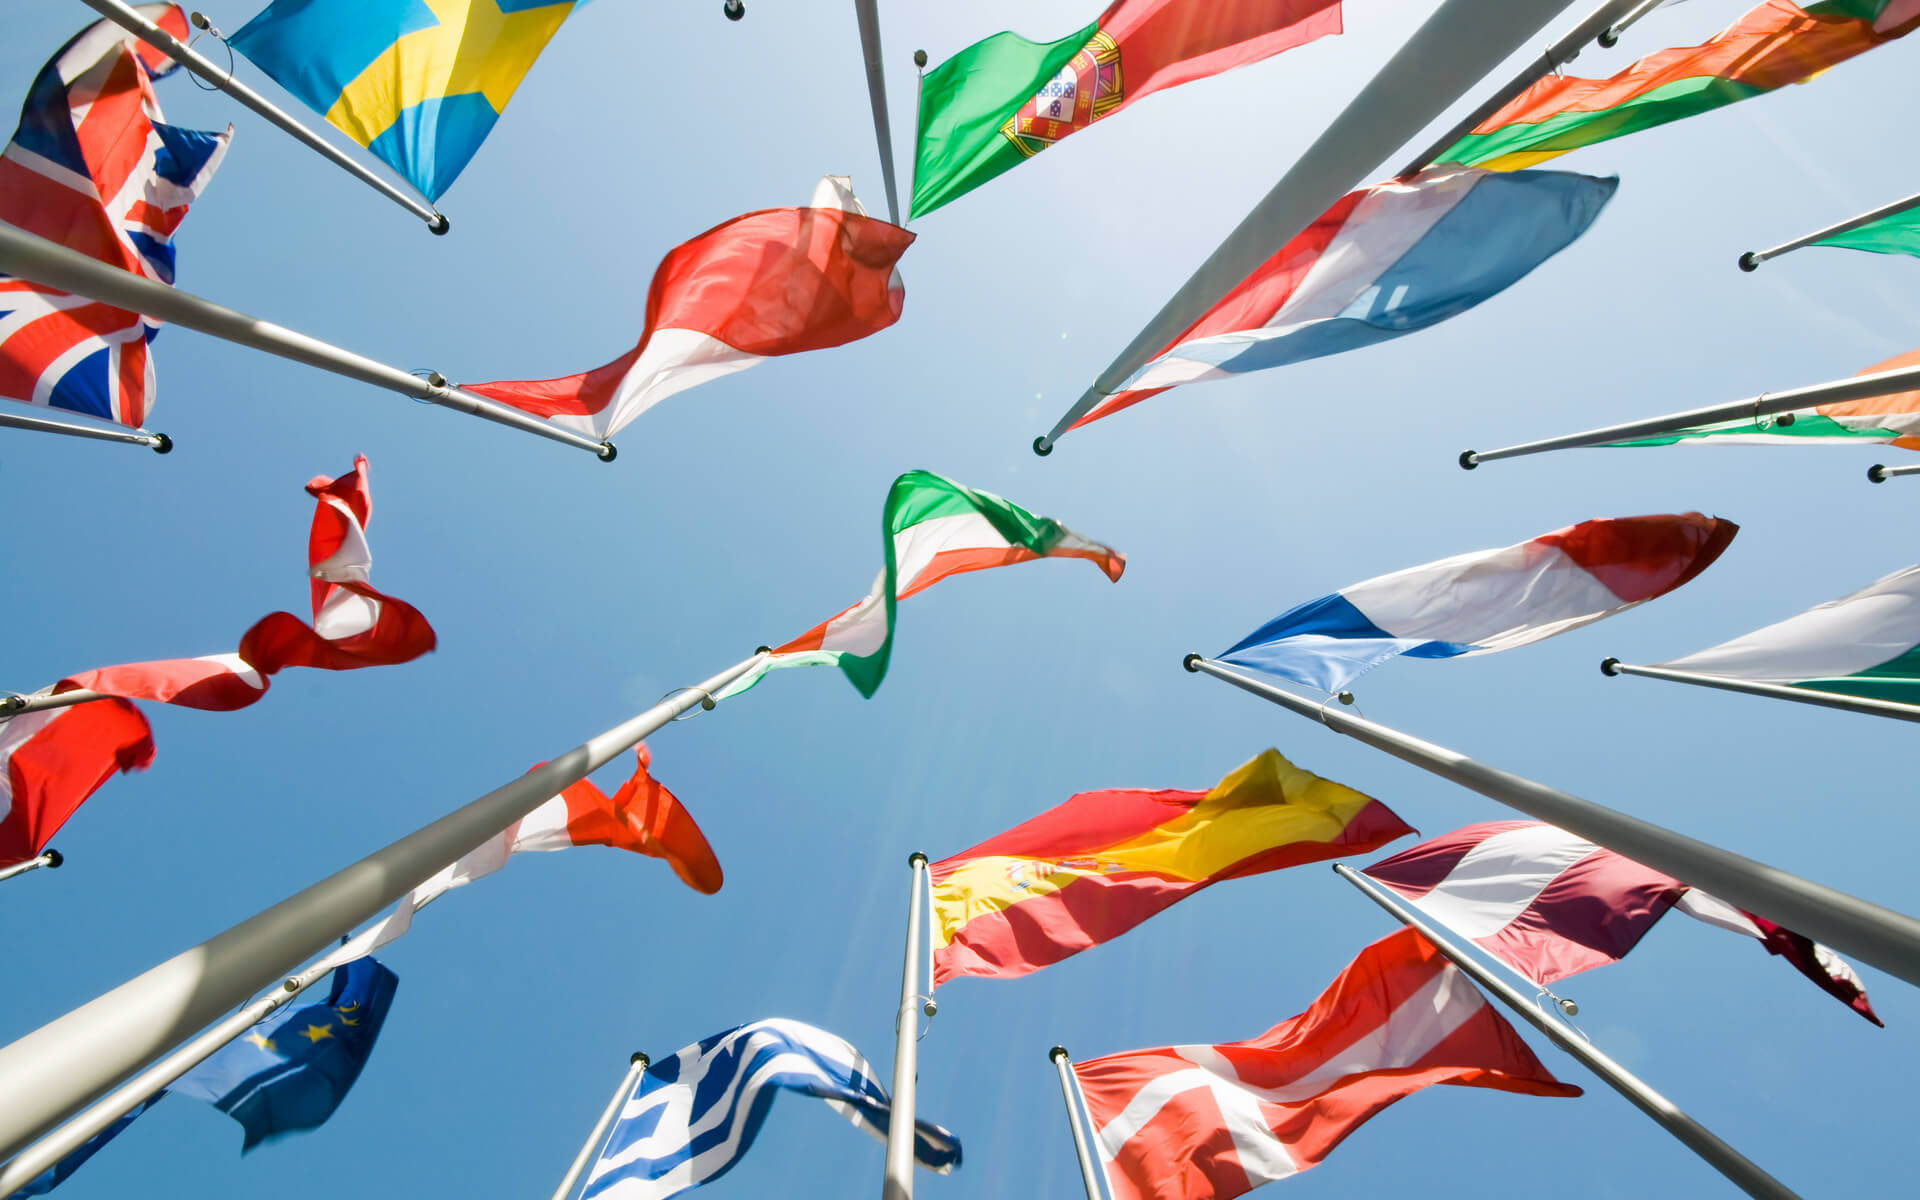 bg-flags-europe-international-h1920w1200